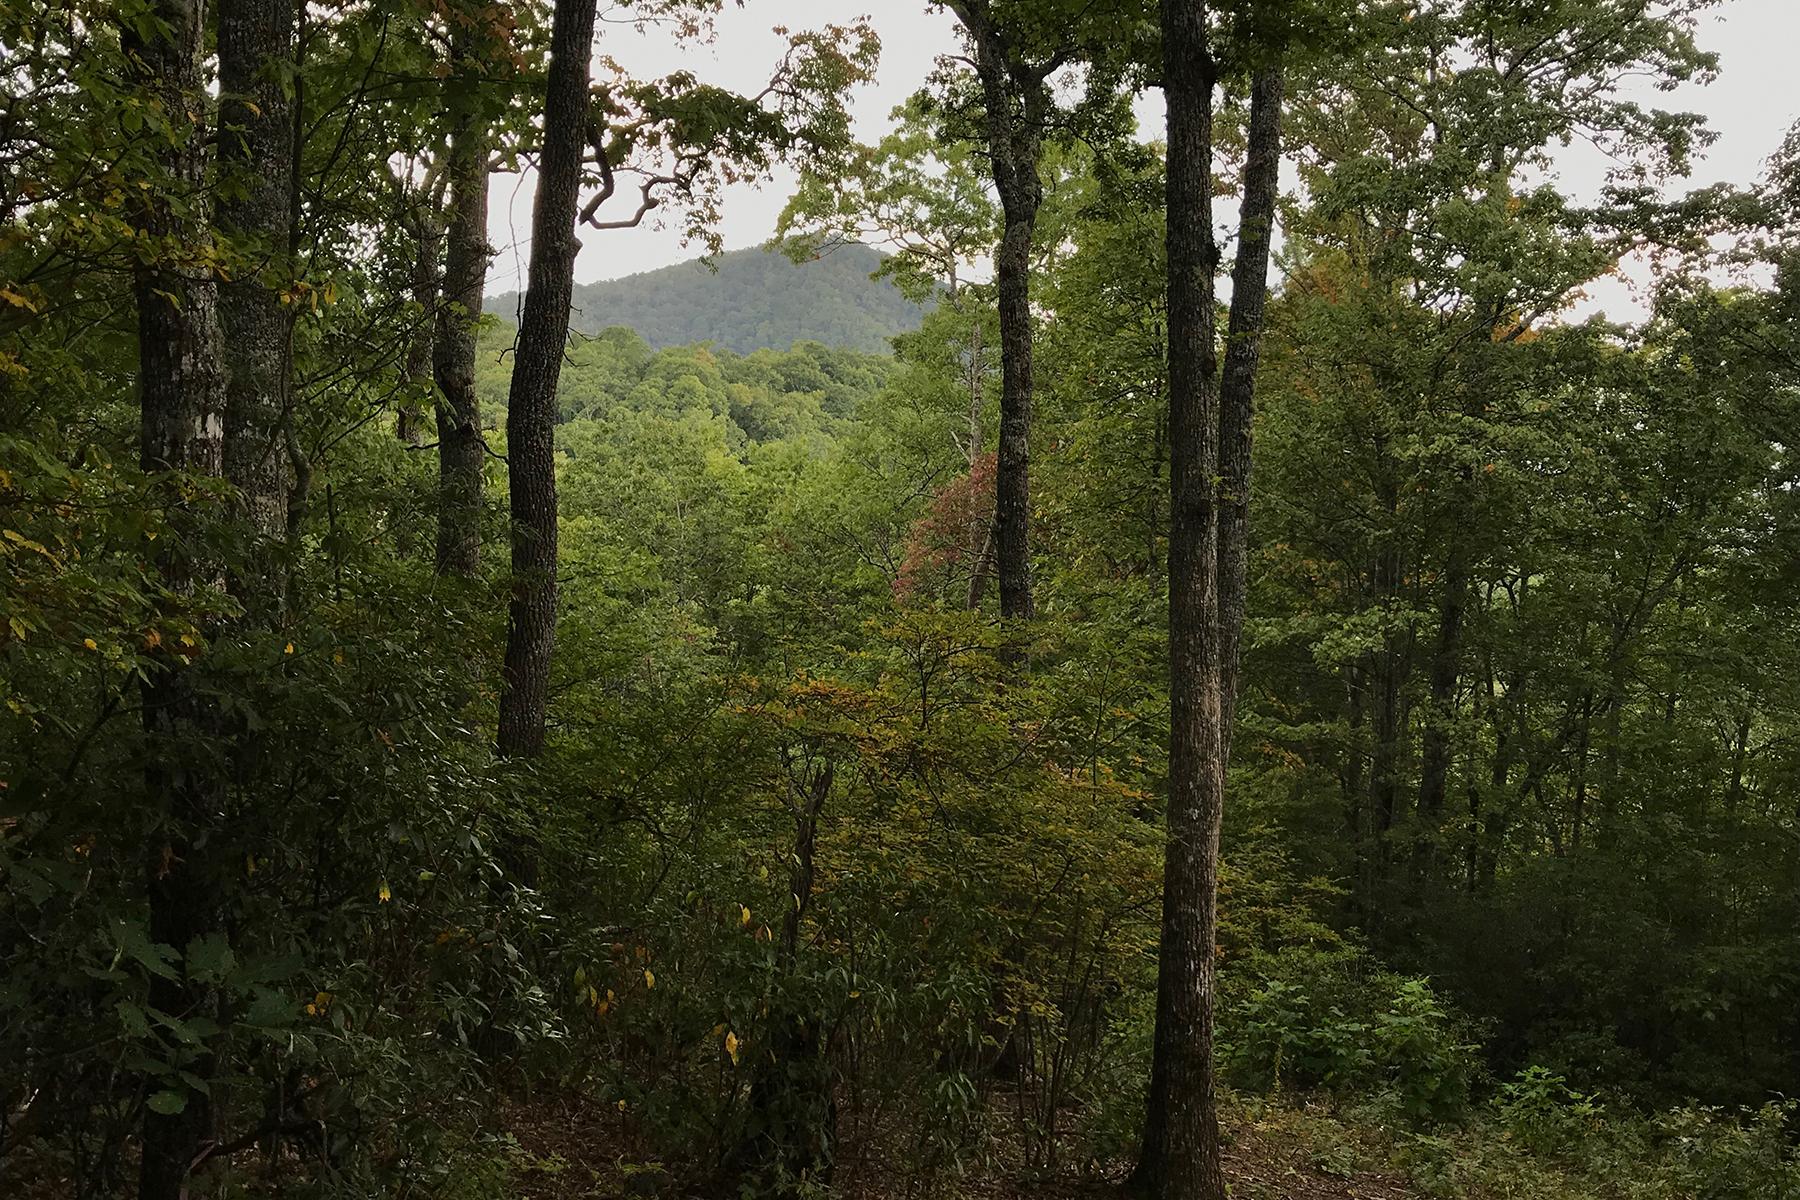 Land for Sale at BALSAM MOUNTAIN PRESERVE 148 Preserve Rd , 148 Sylva, North Carolina 28779 United States